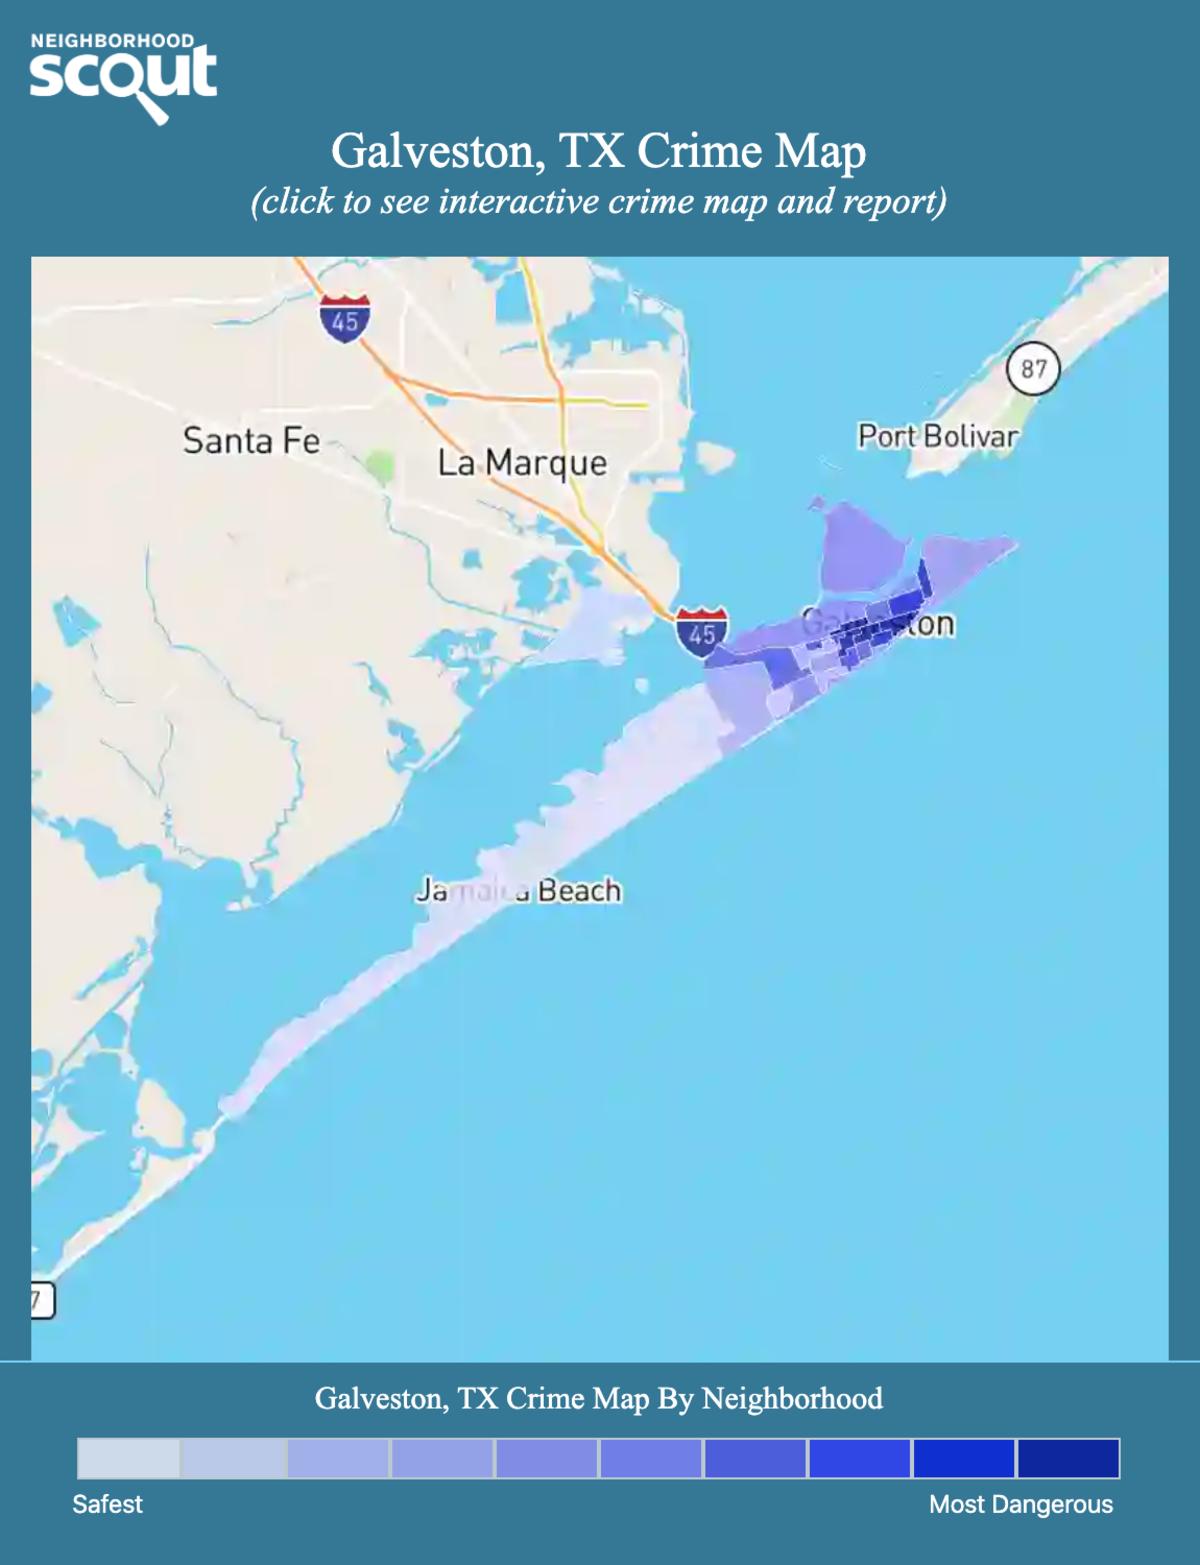 Galveston, TX Crime Rates and Statistics - NeighborhoodScout on